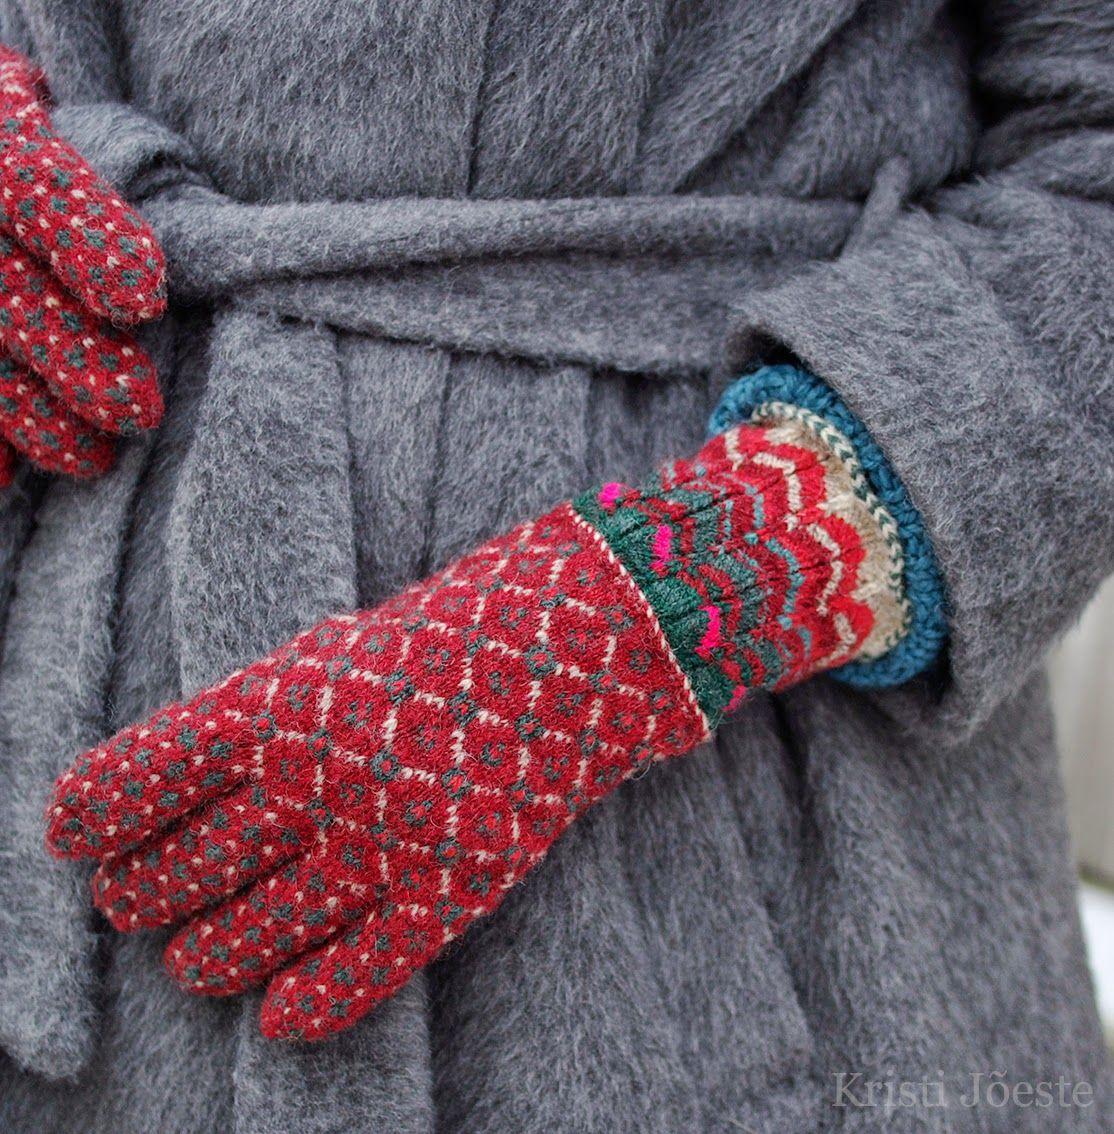 Kristi jeste blogi kindadgloves knit wit pinterest gloves kristi jeste blogi kindadgloves bankloansurffo Images